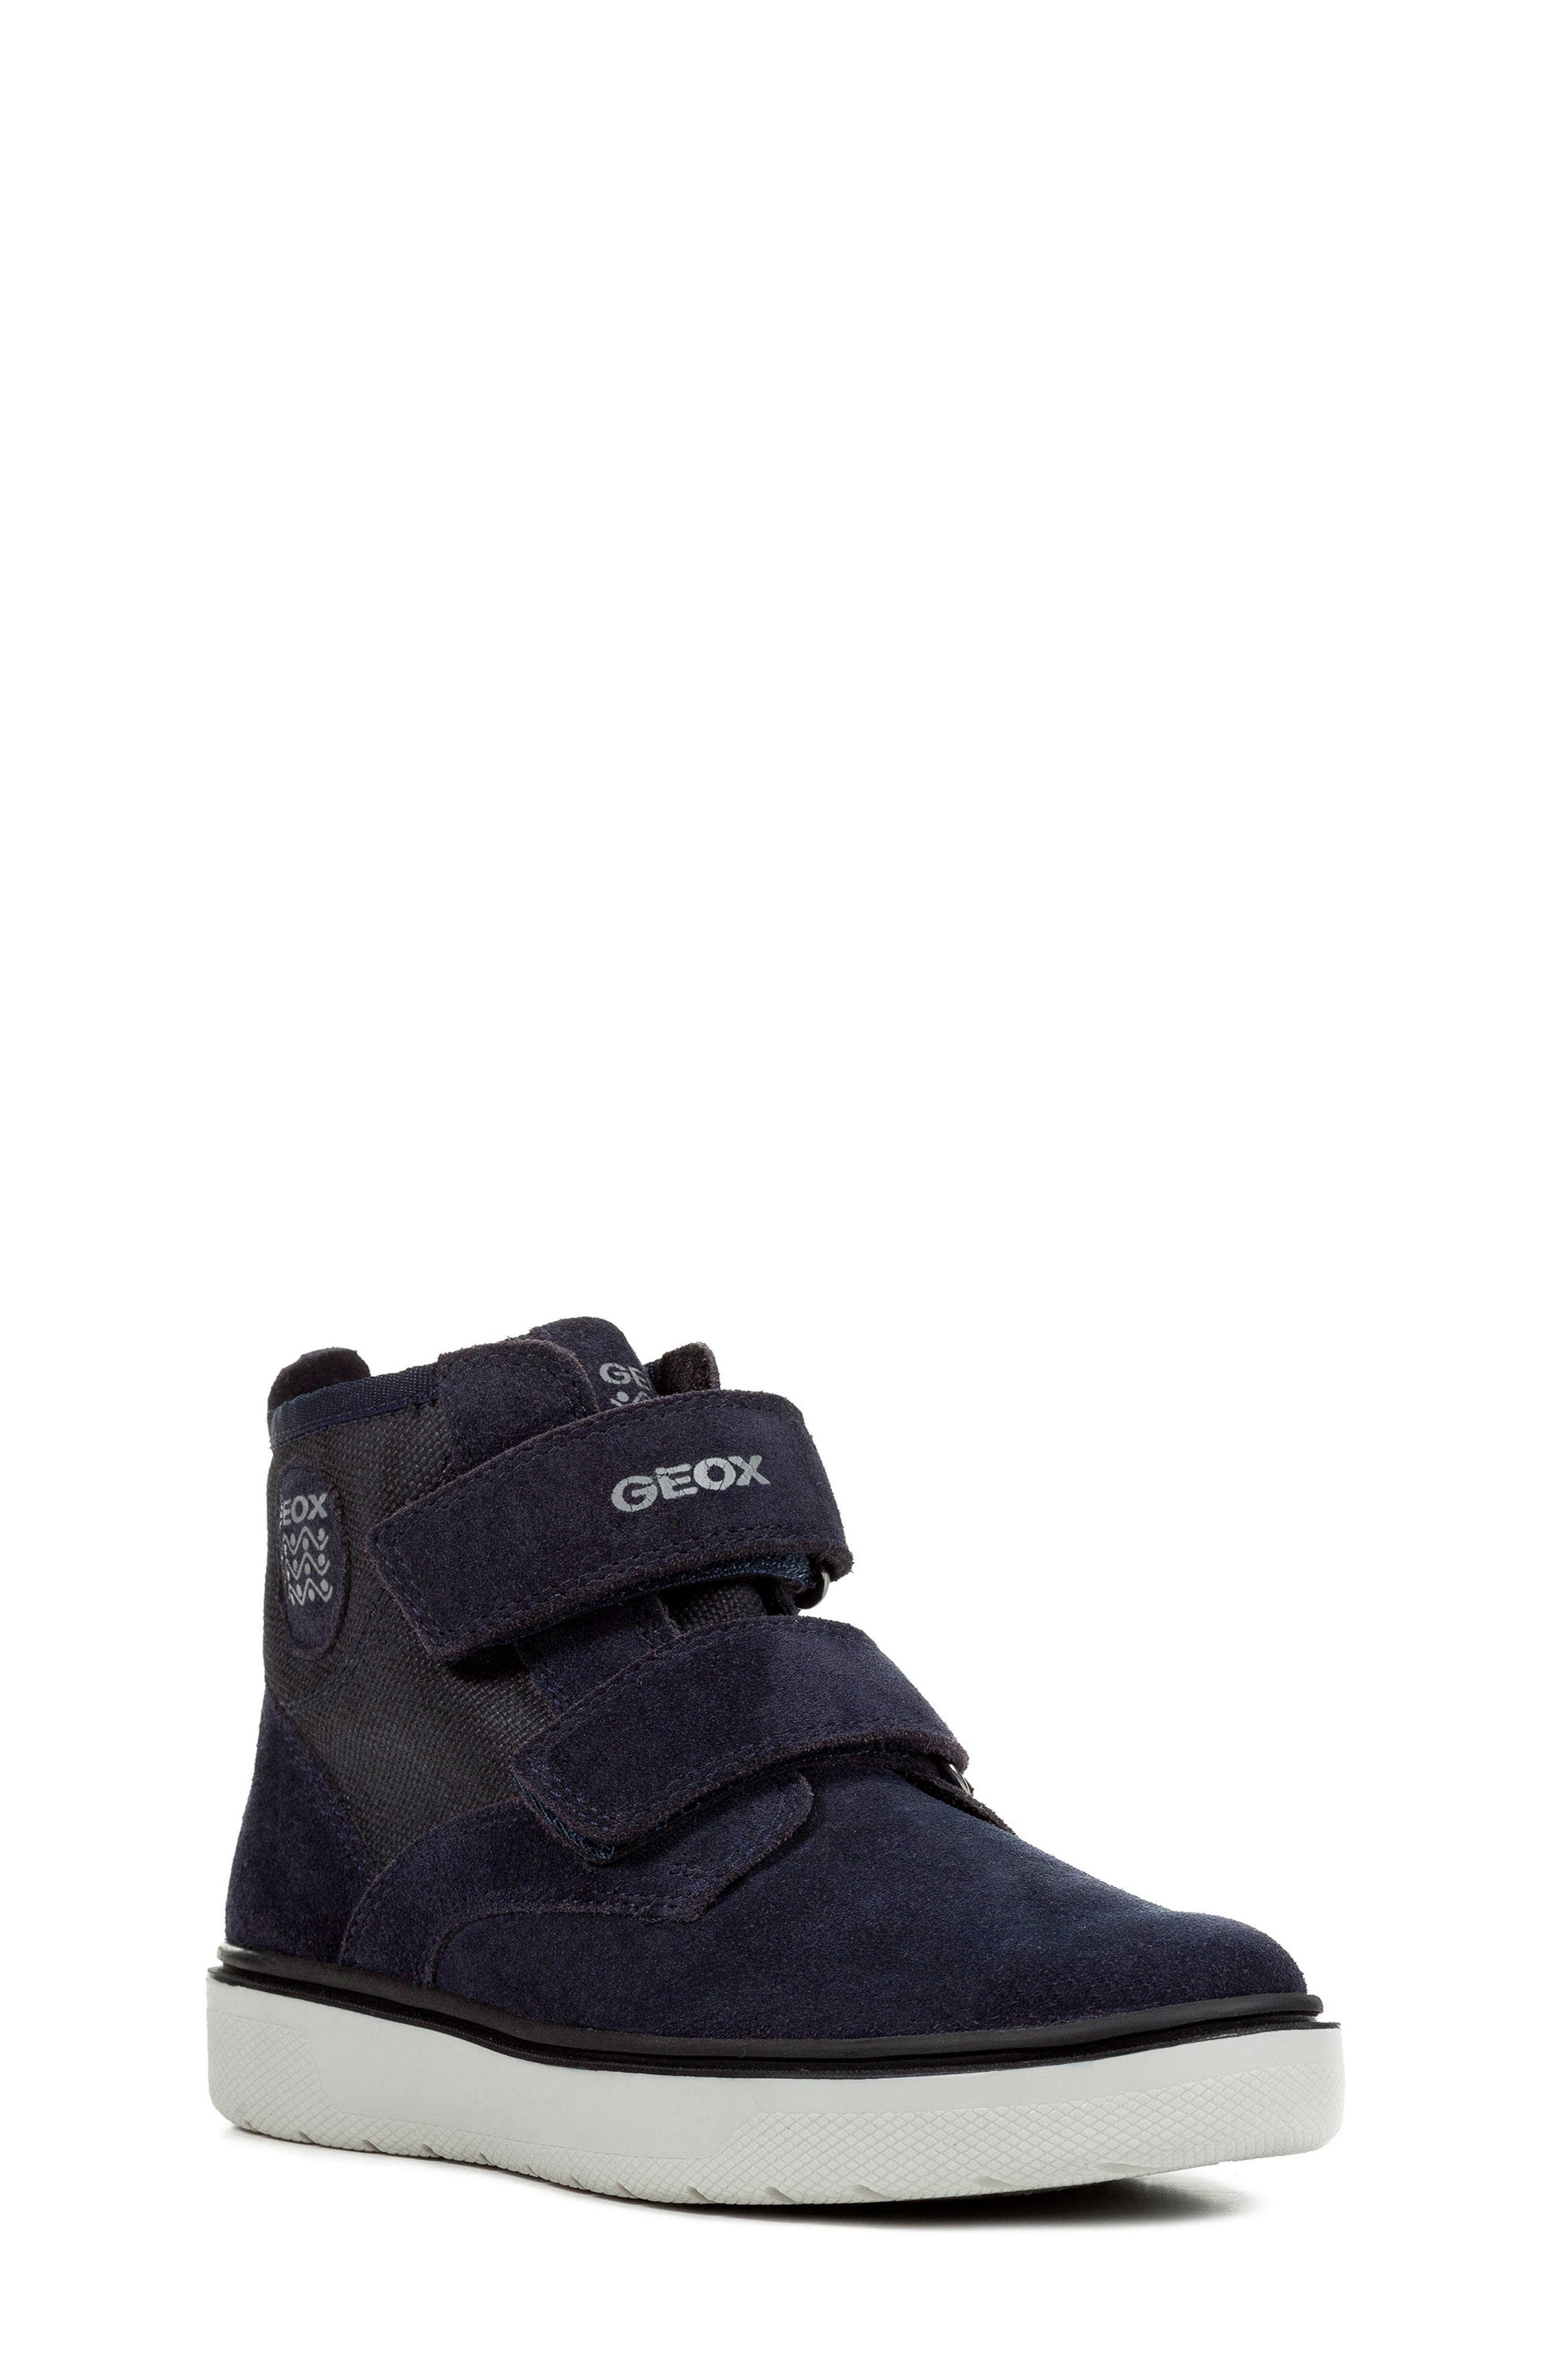 Riddock High Top Sneaker,                             Main thumbnail 1, color,                             NAVY/GREY